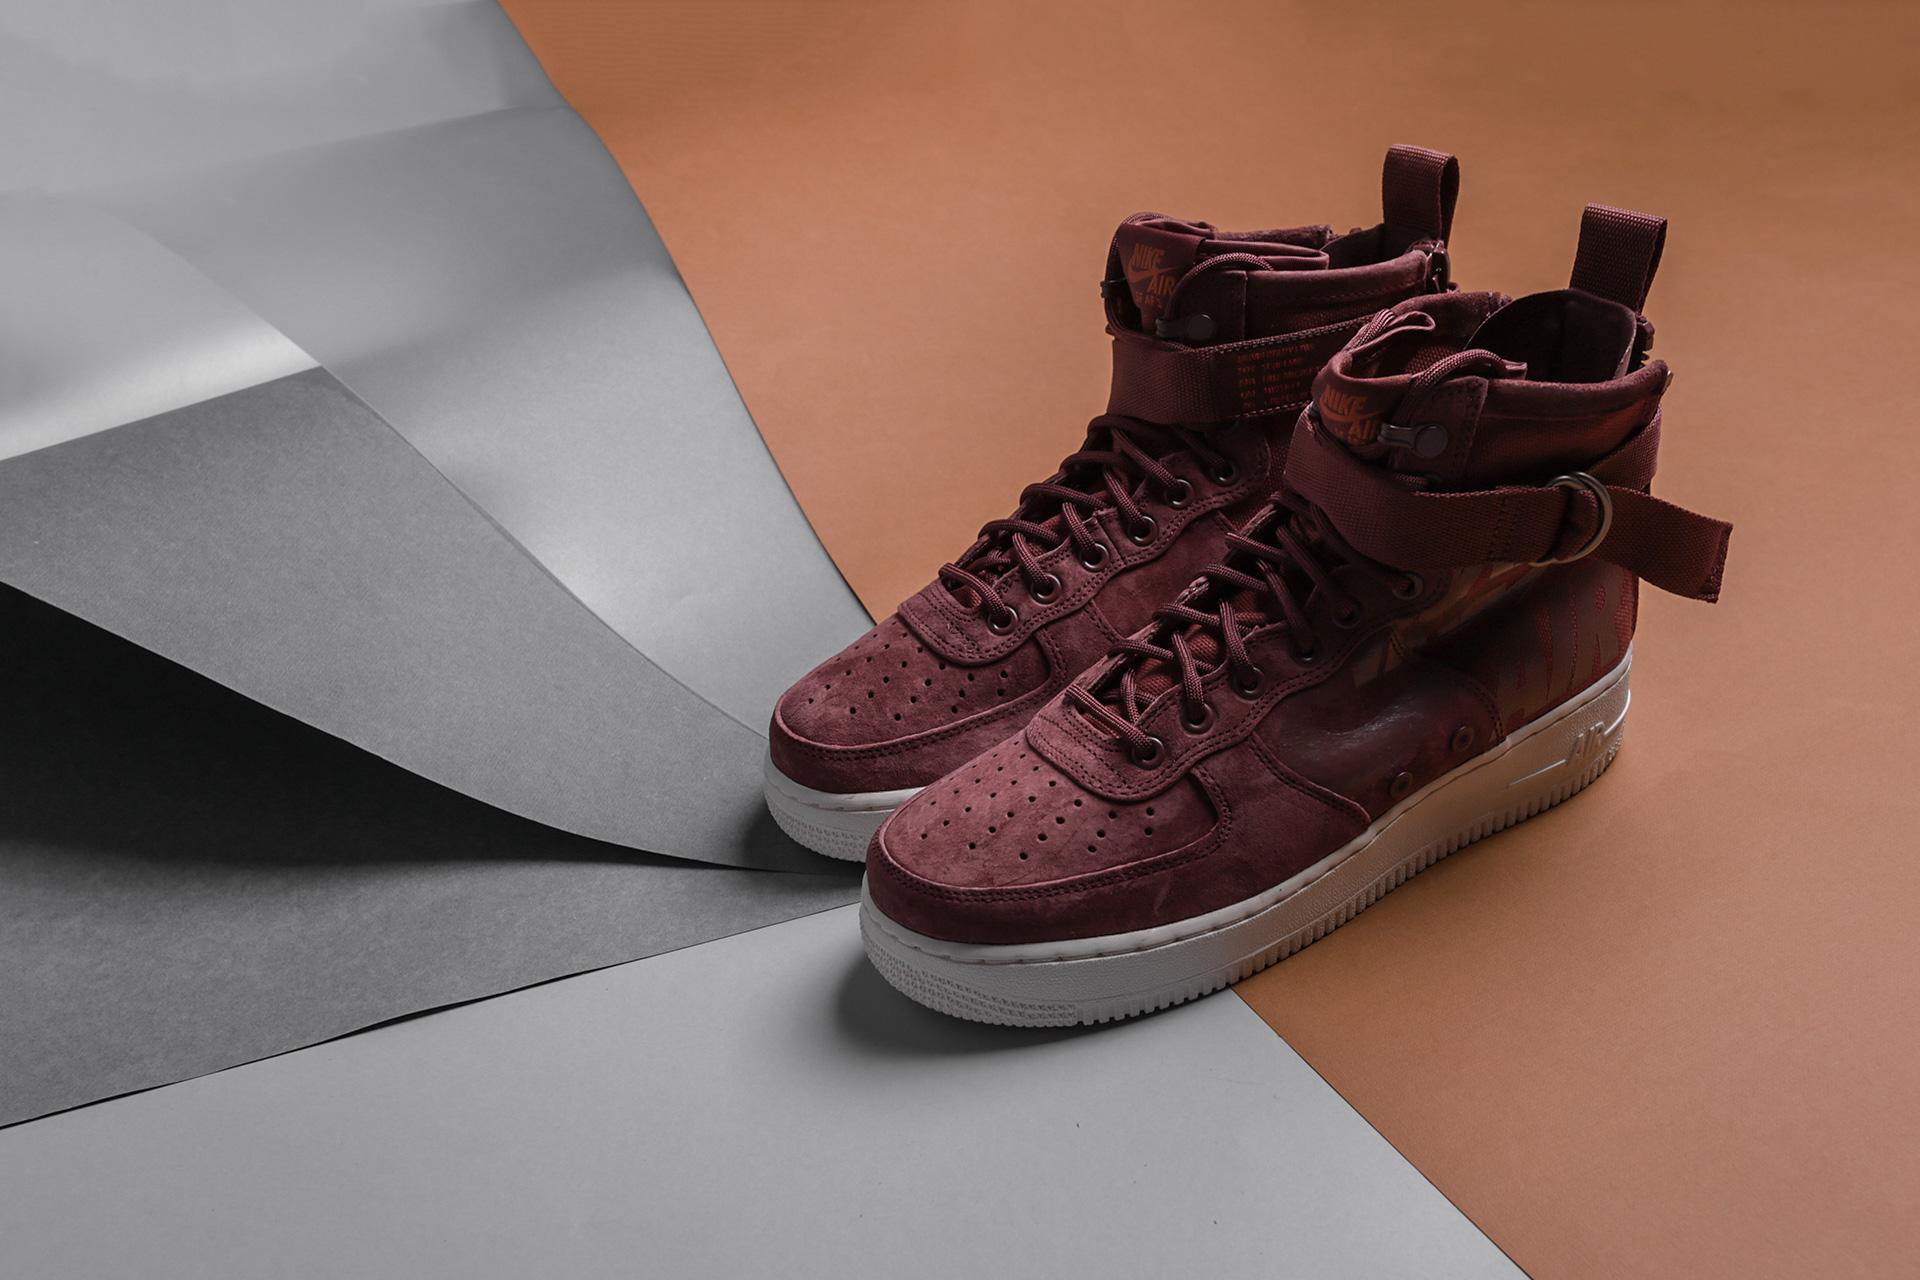 8d7a36d90ec2 ... Купить мужские коричневые кроссовки Nike SF Air Force 1 Mid - фото 5  картинки